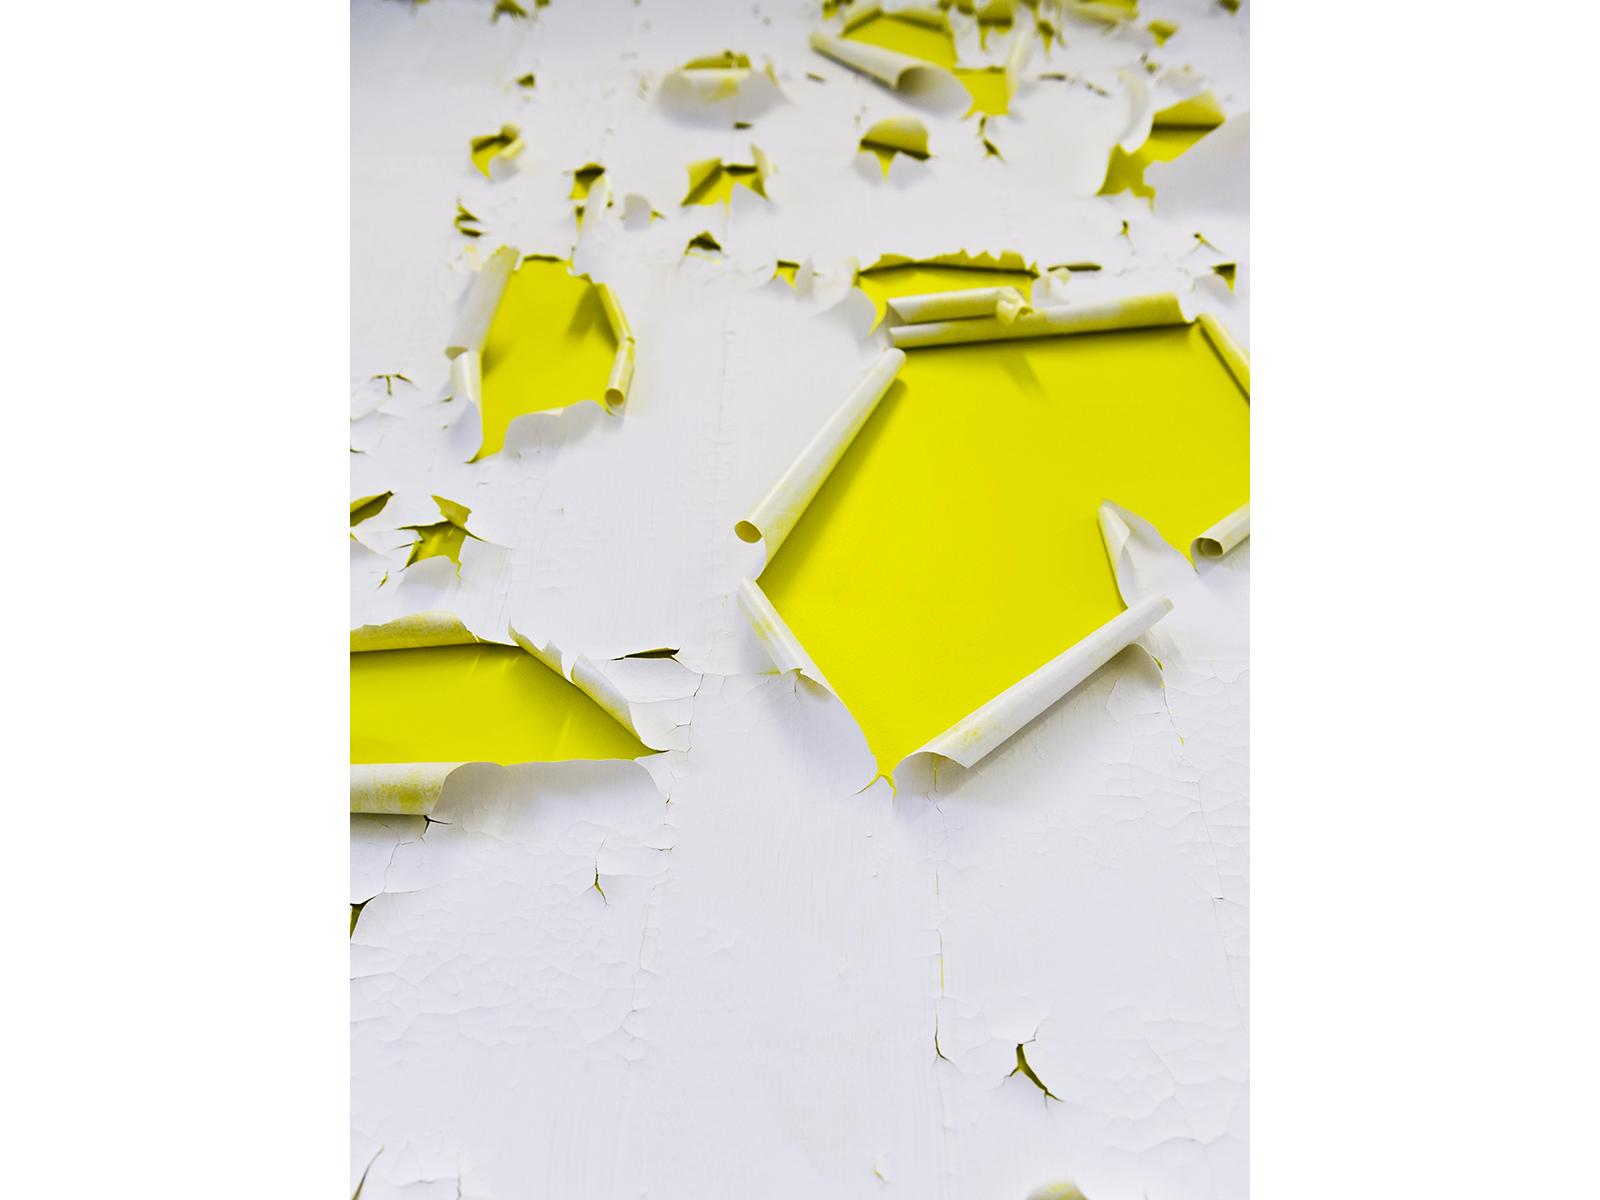 Benoit-Delaunay-artiste-installations-Un-Sentiment-de-Chaleur-06